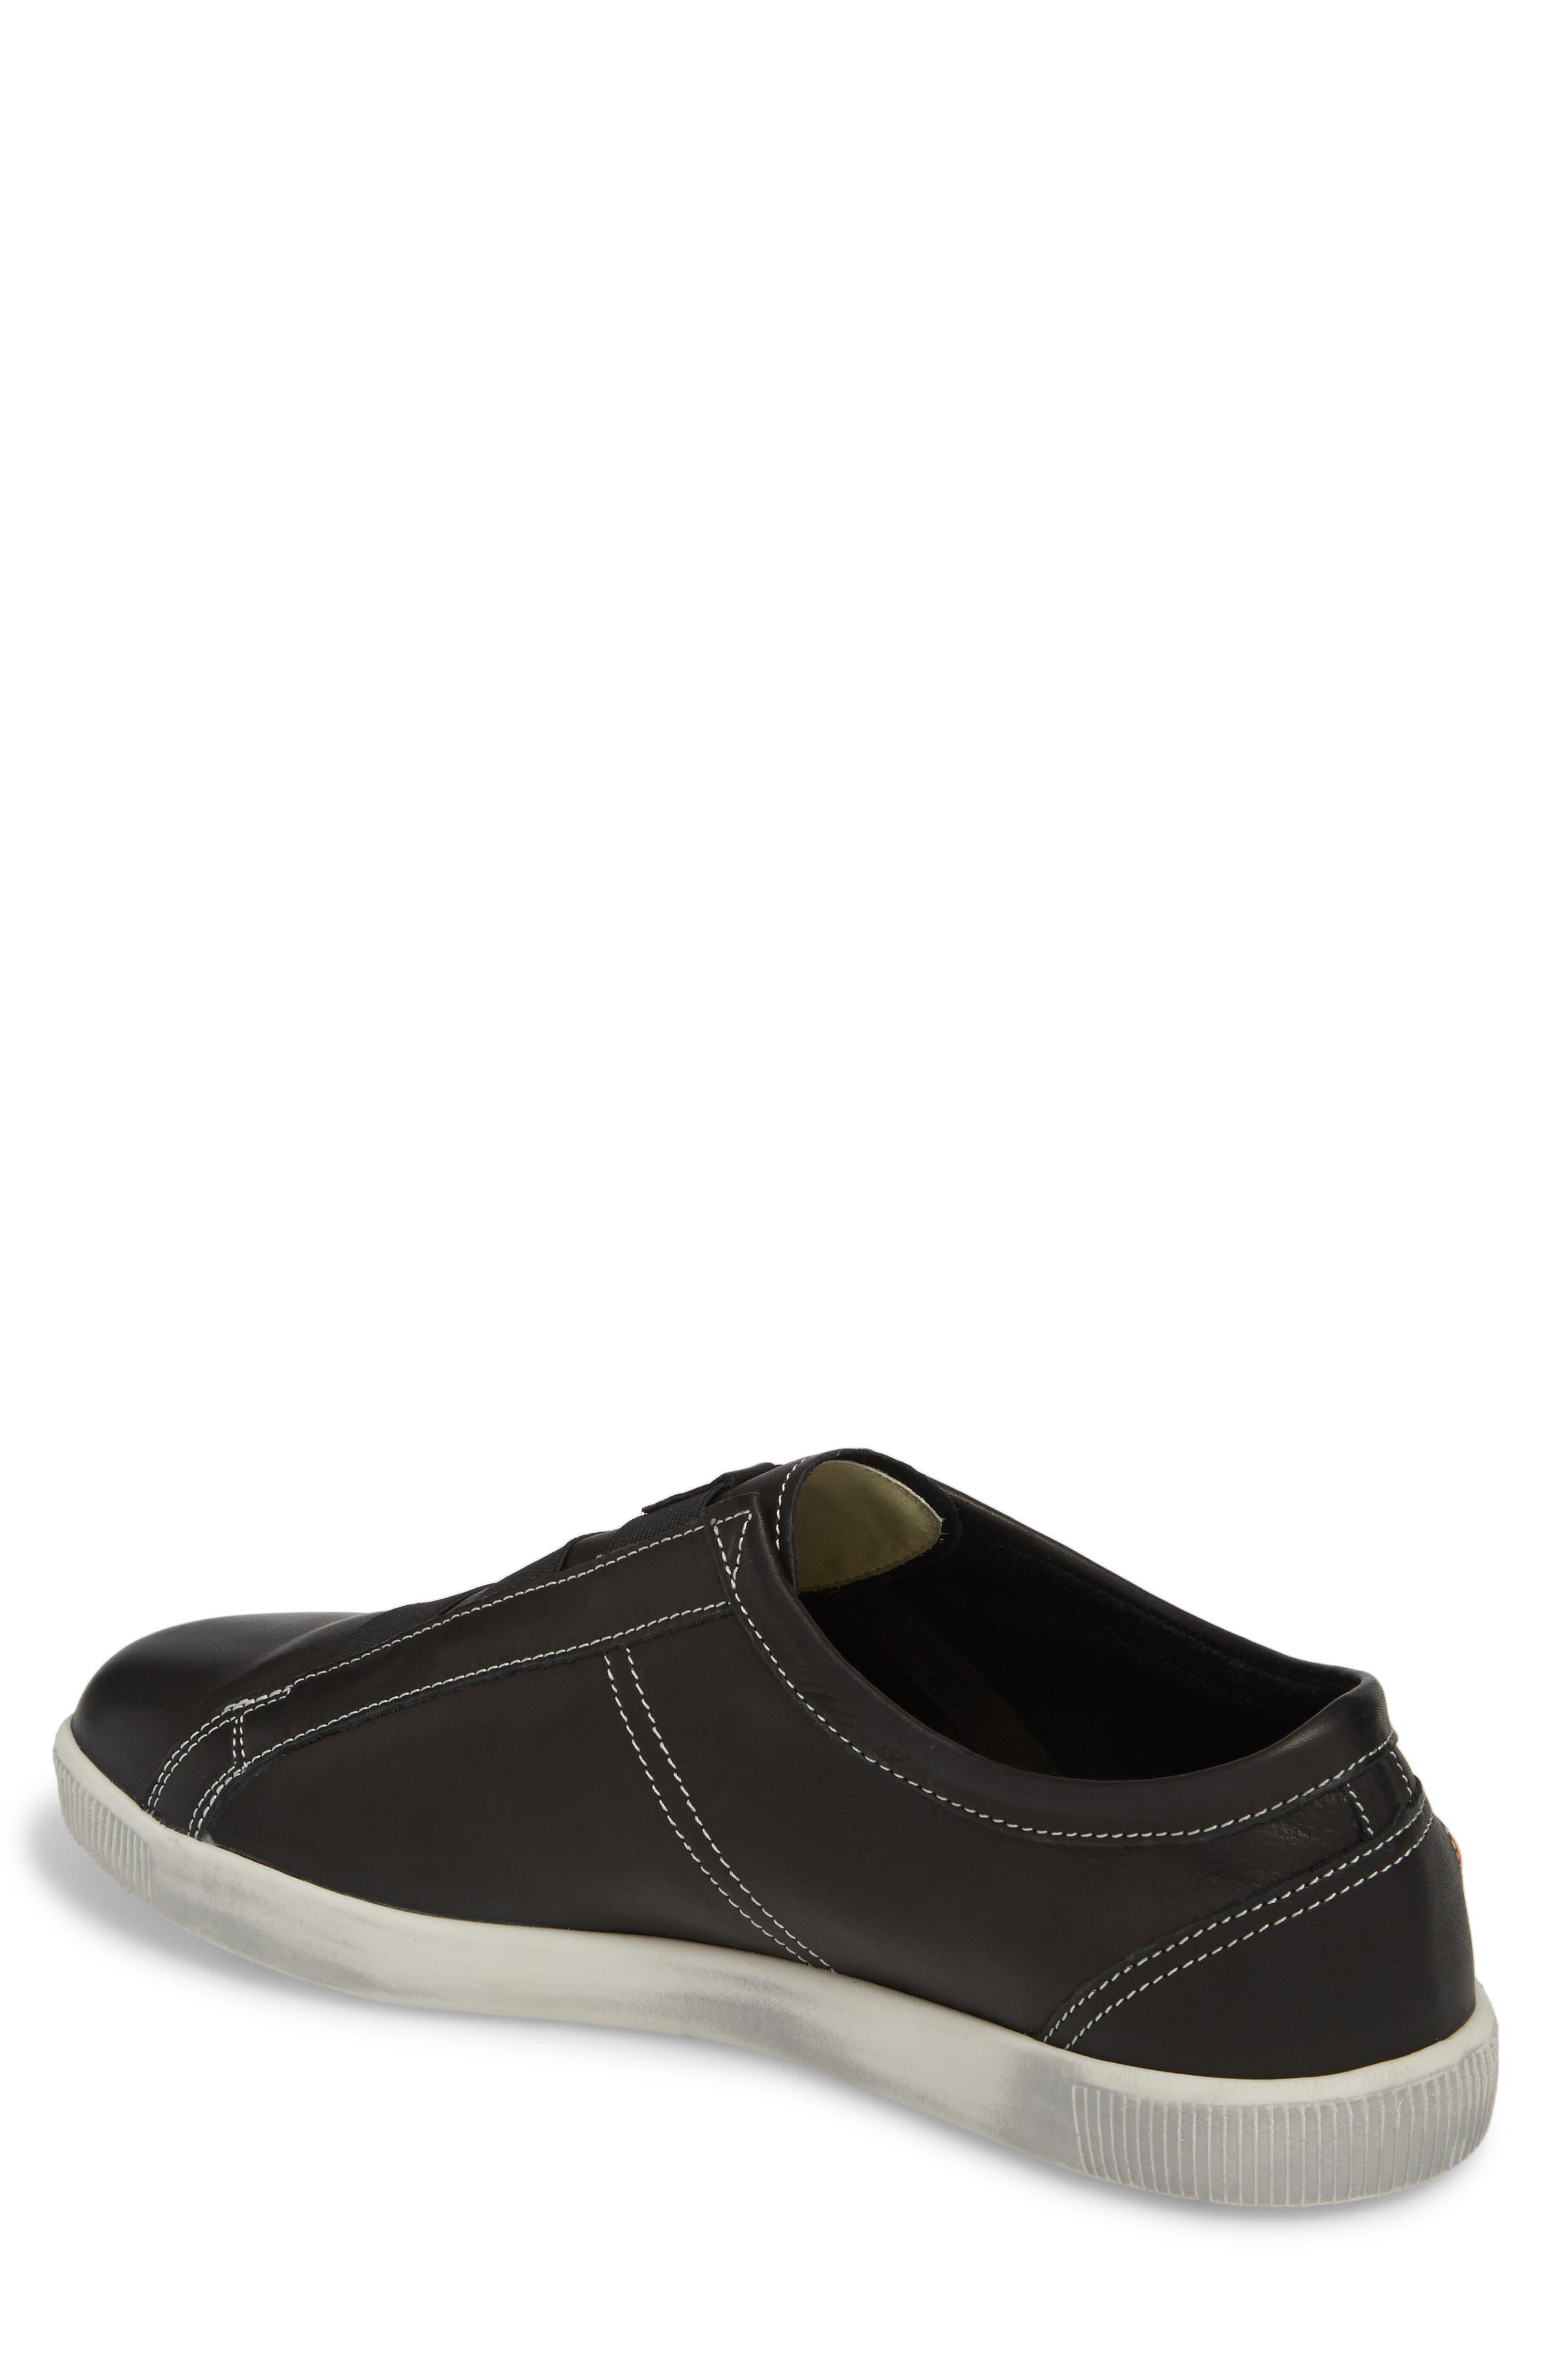 Tip Laceless Sneaker,                             Alternate thumbnail 2, color,                             Black Leather